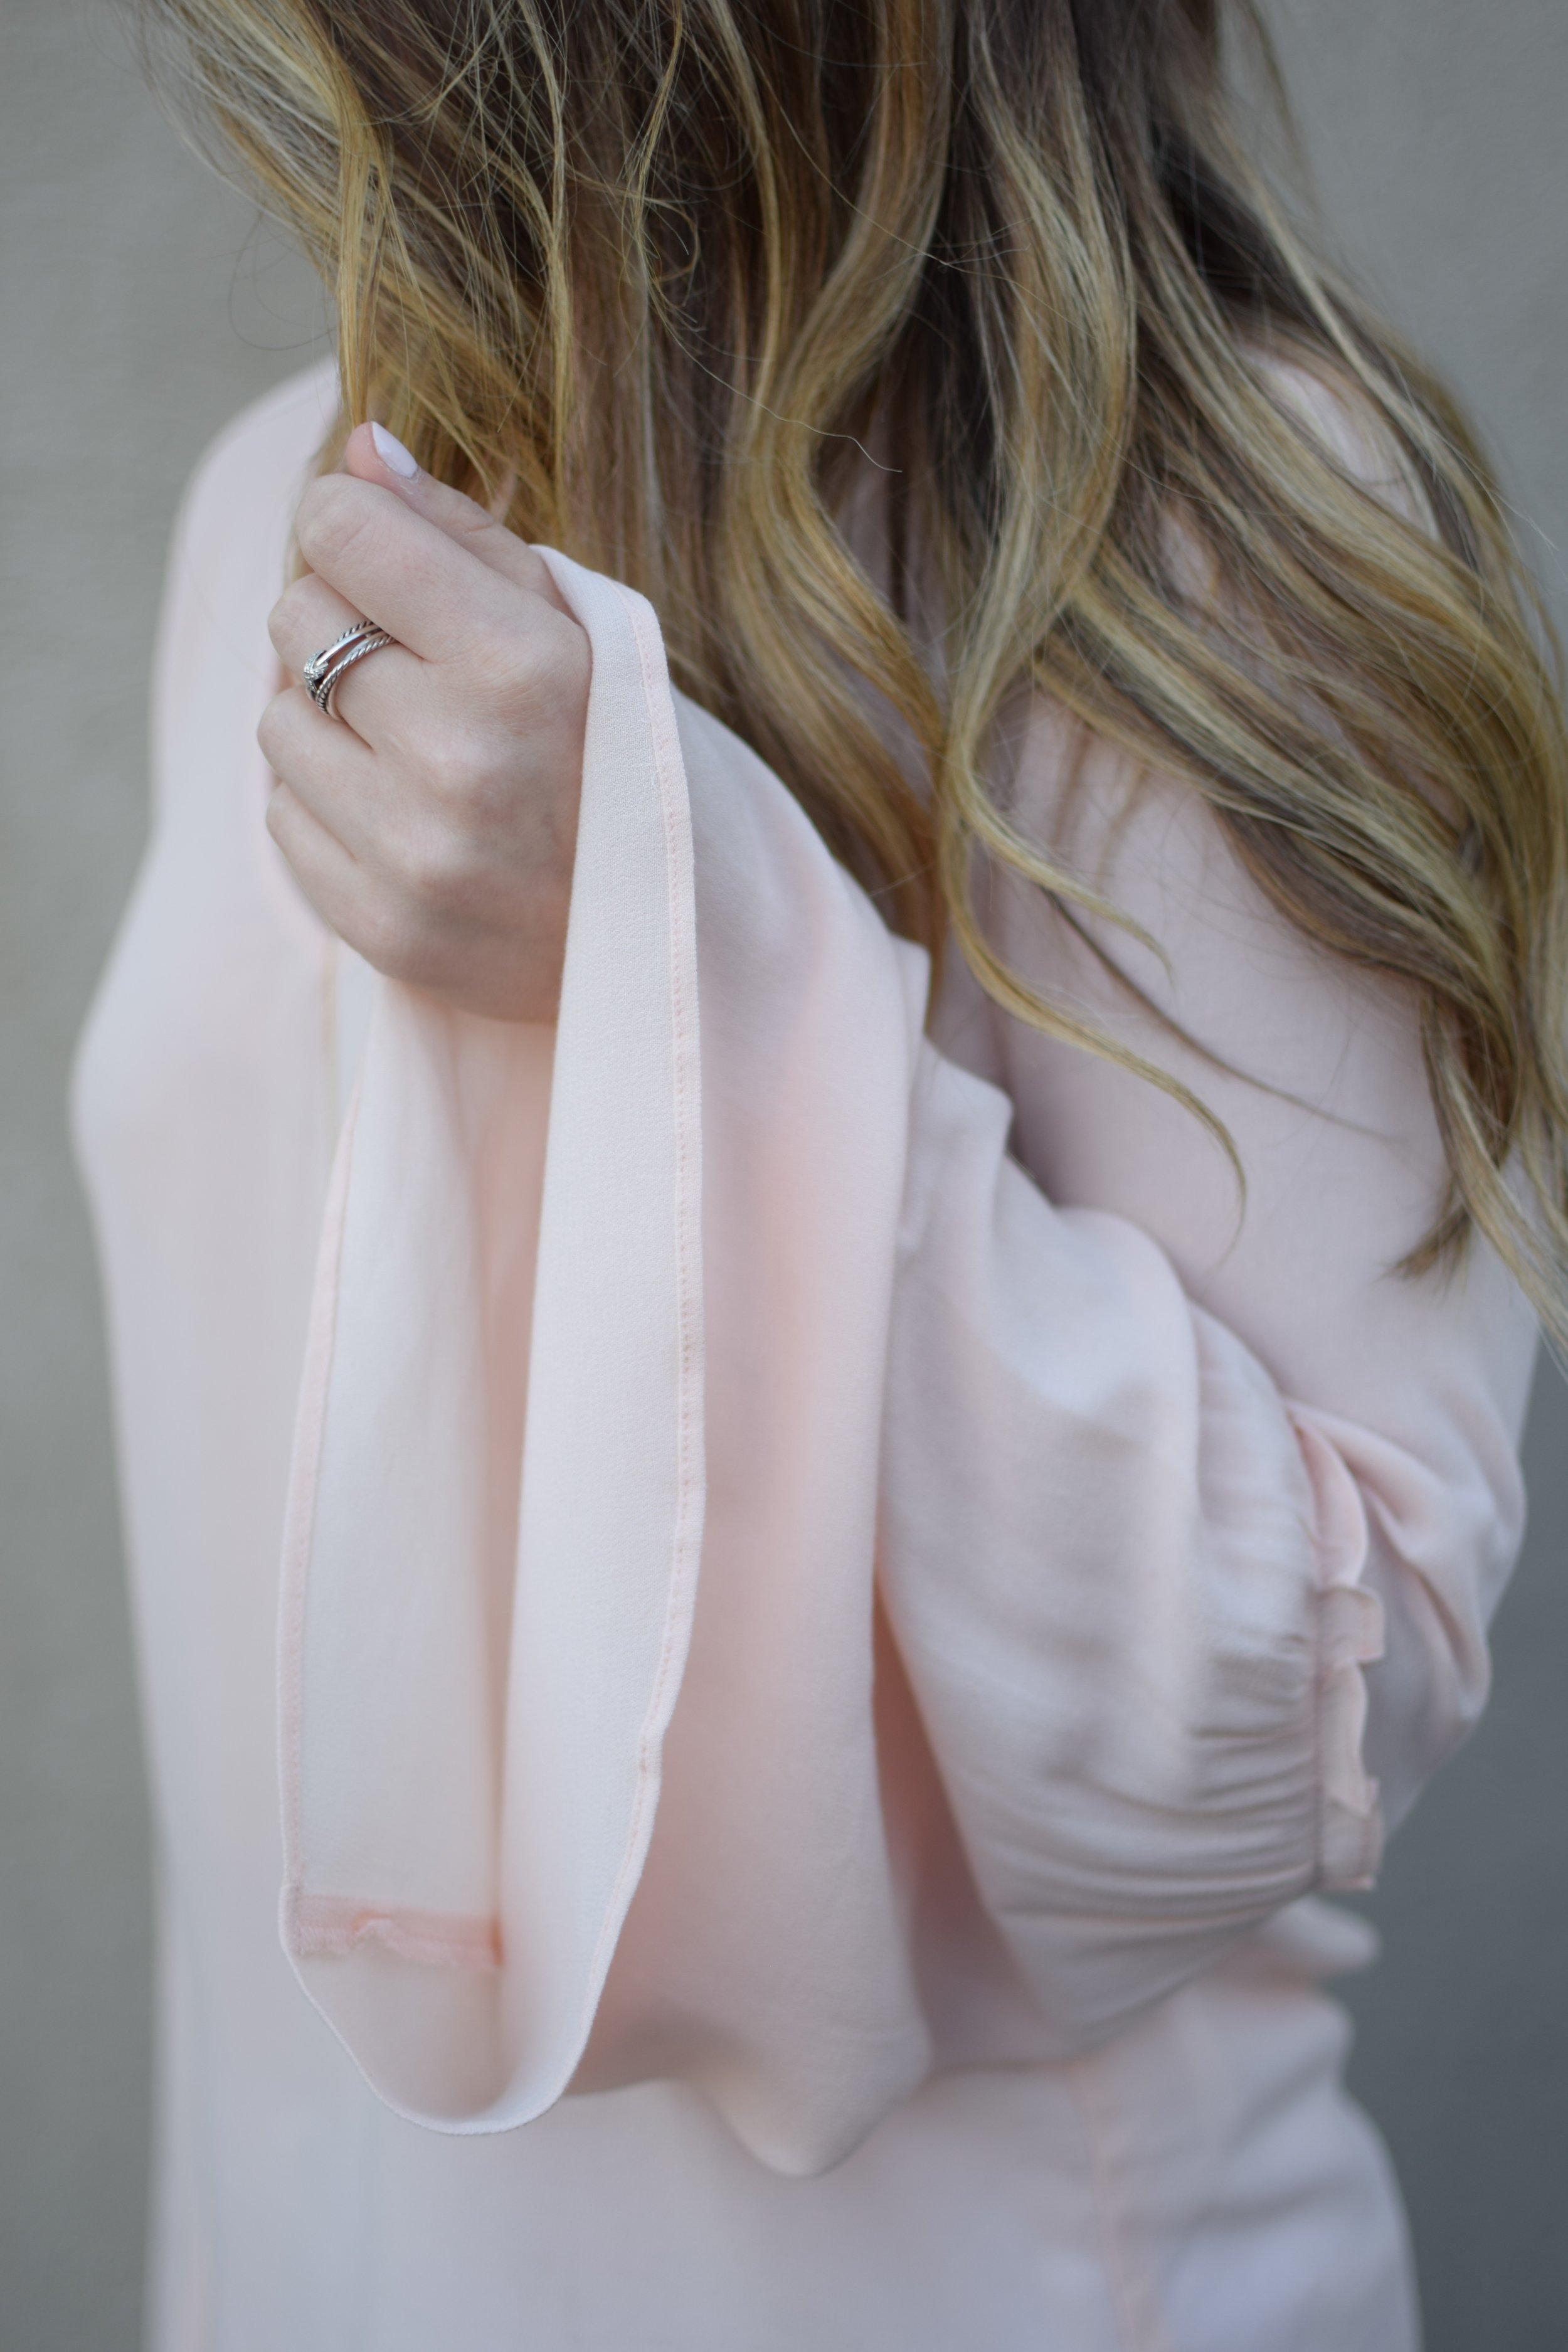 blush bell sleeve top / david yurman ring / spring outfit idea / balayage summer hair